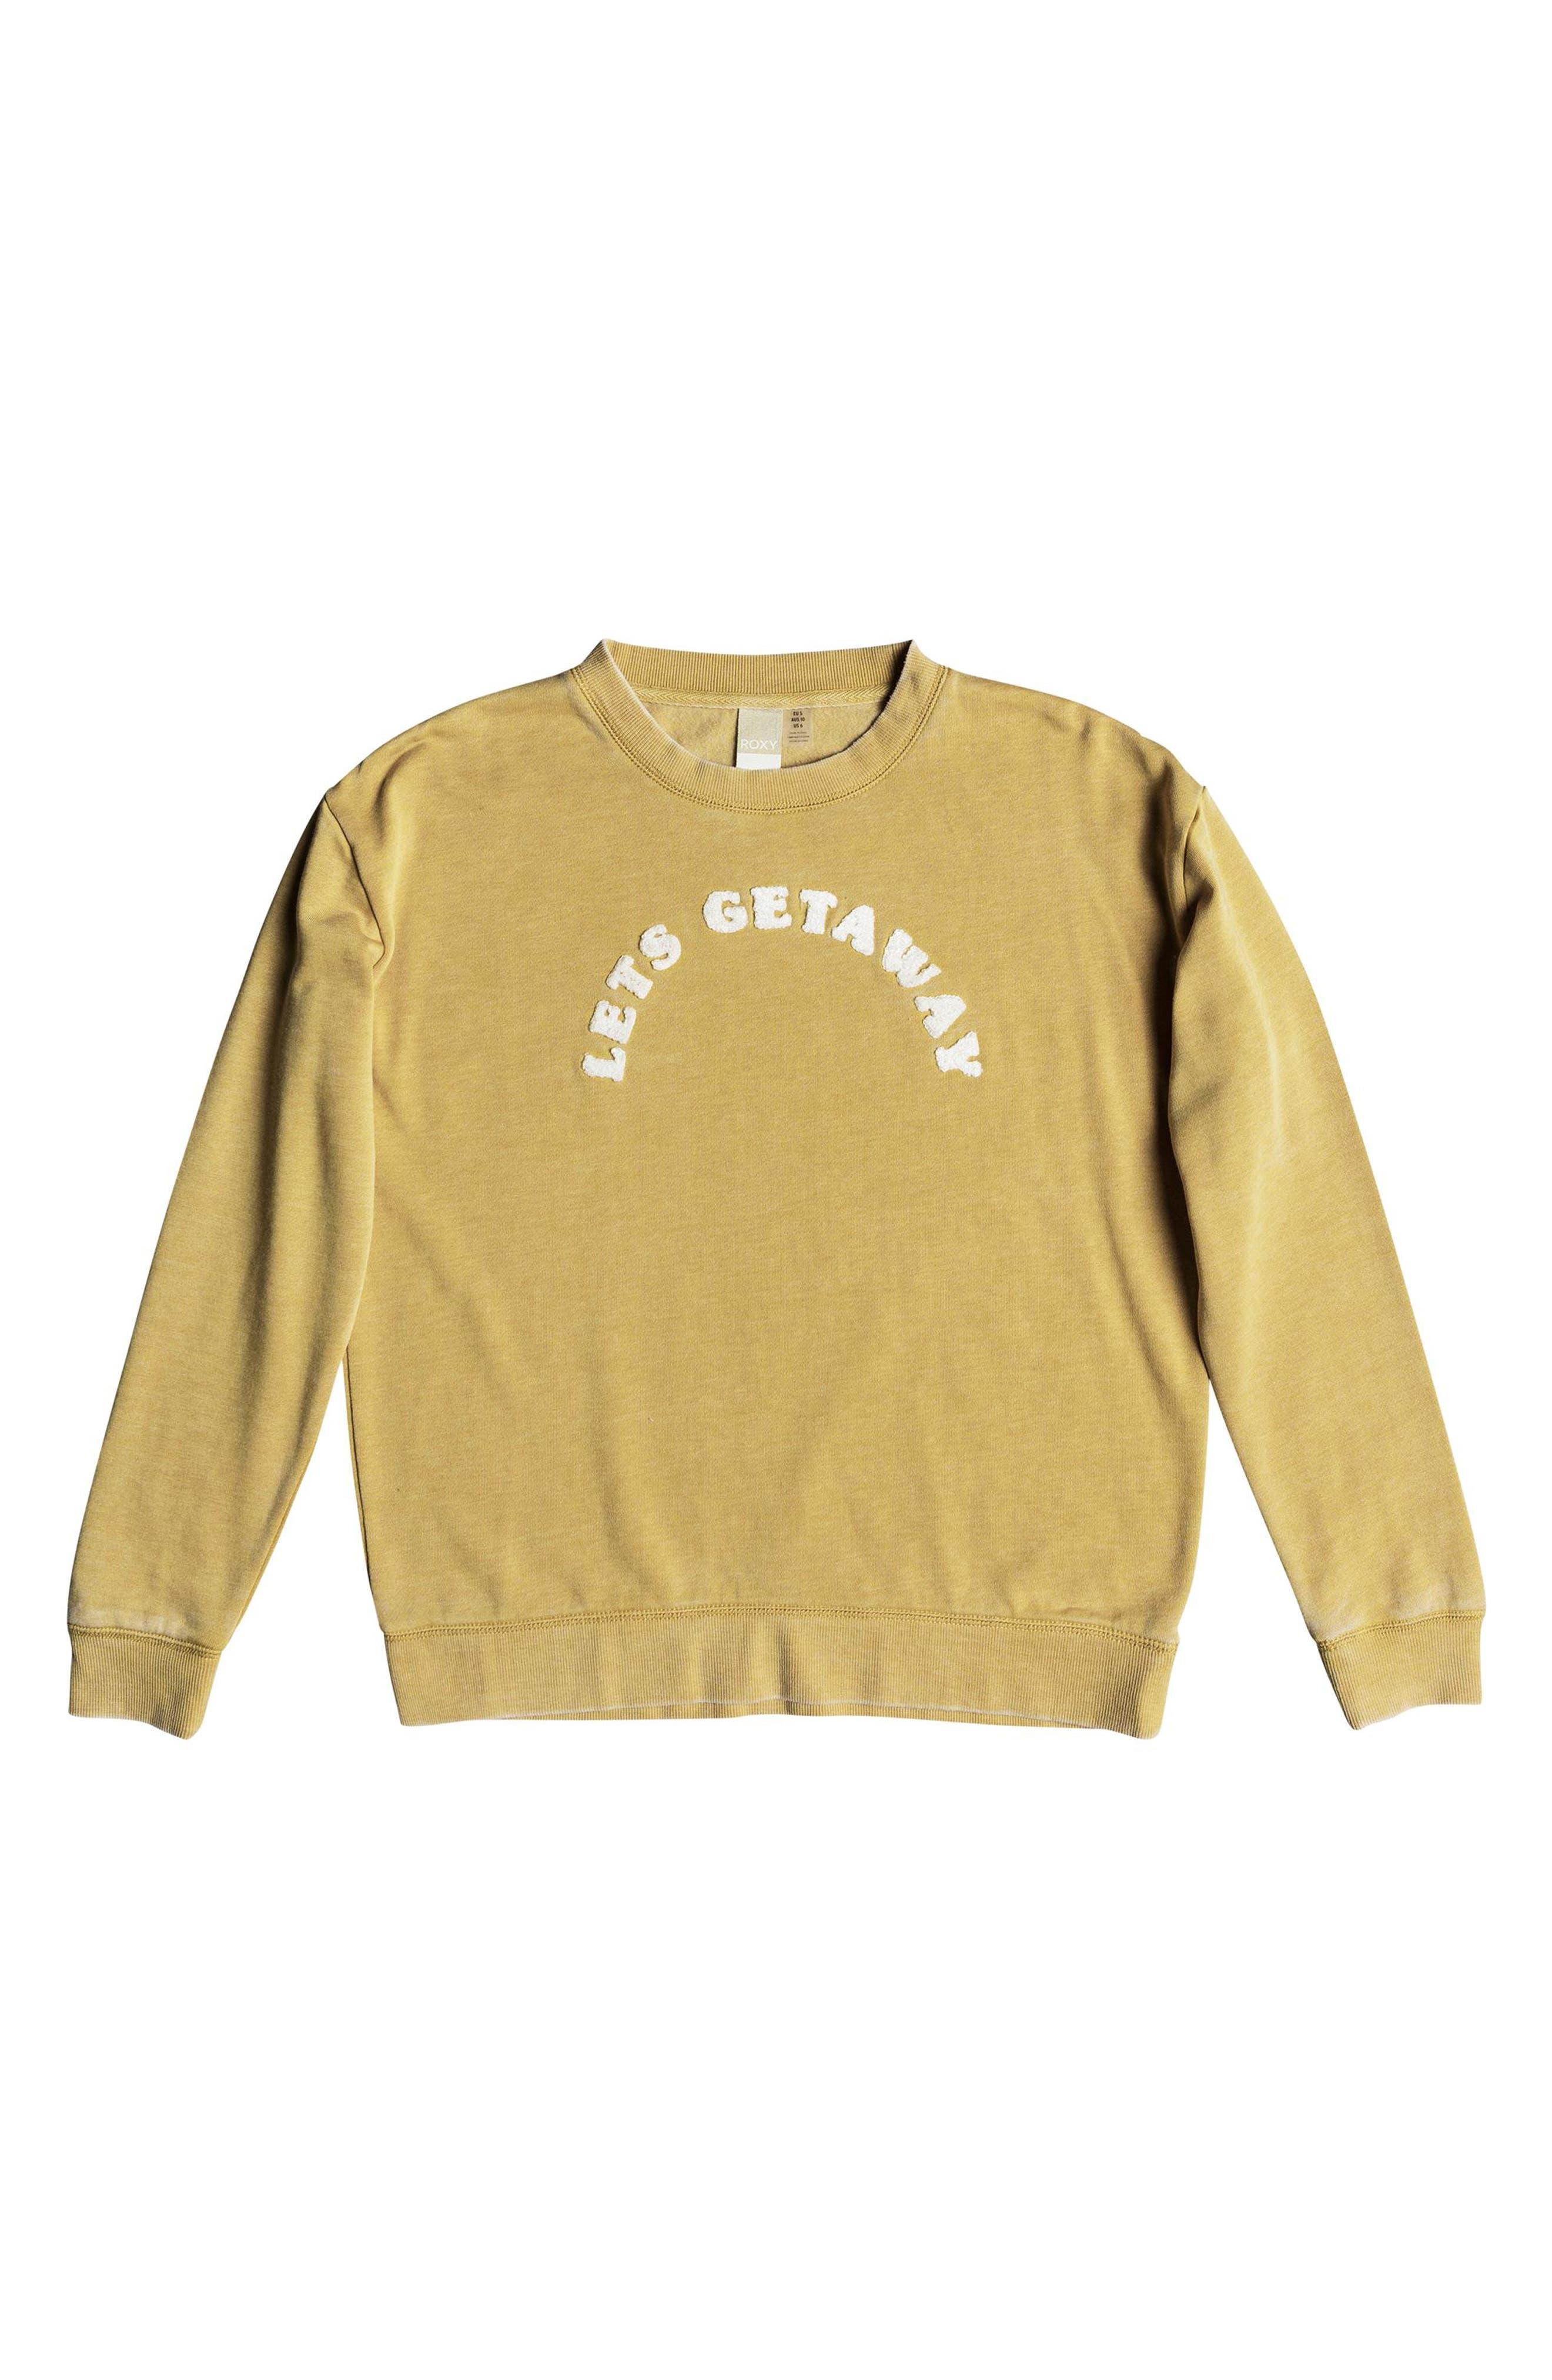 All At Sea Sweatshirt,                             Alternate thumbnail 4, color,                             700